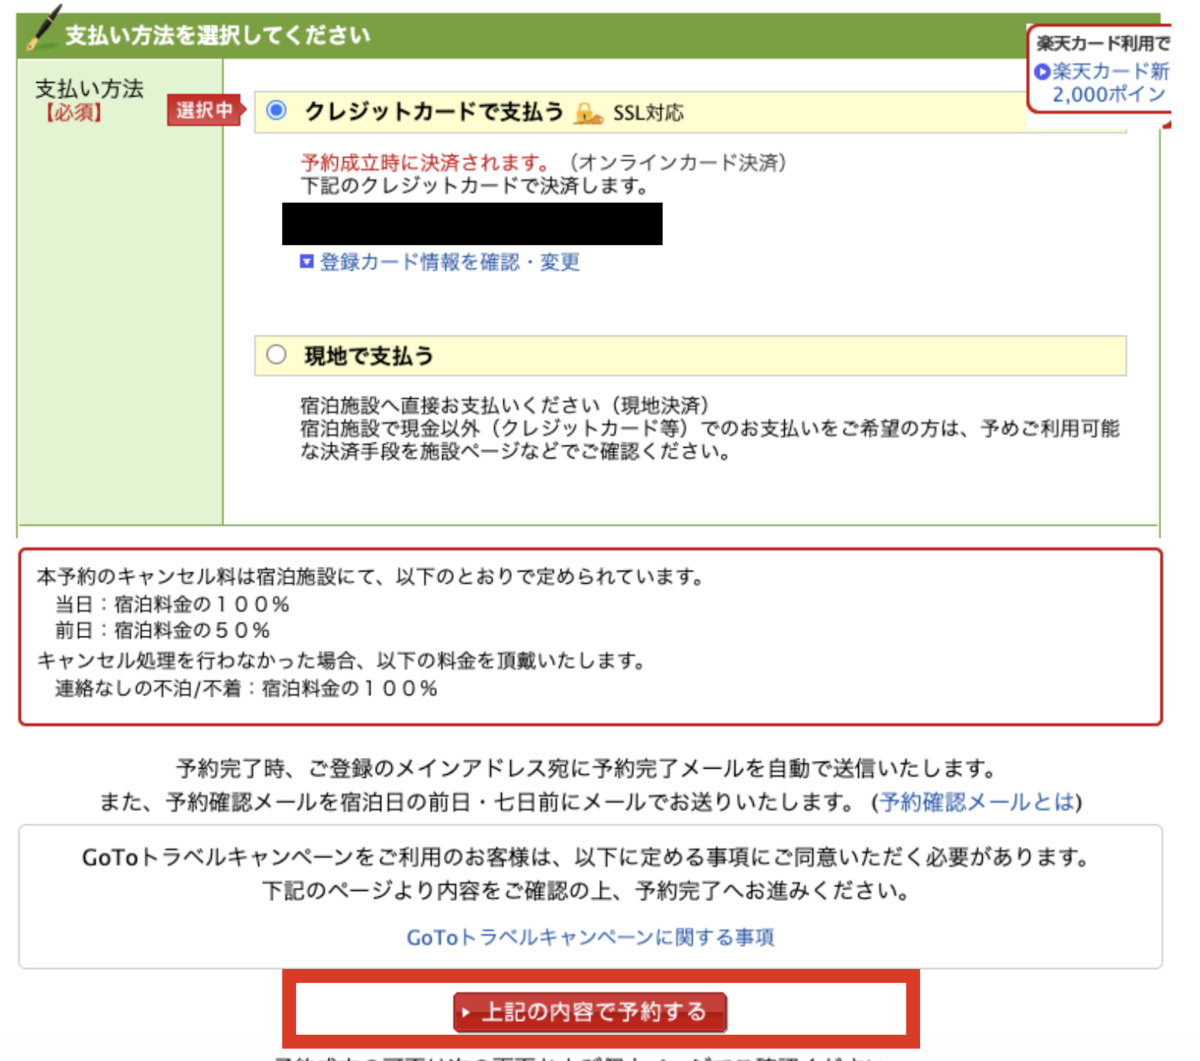 f:id:kinoko1629:20210402010510p:plain